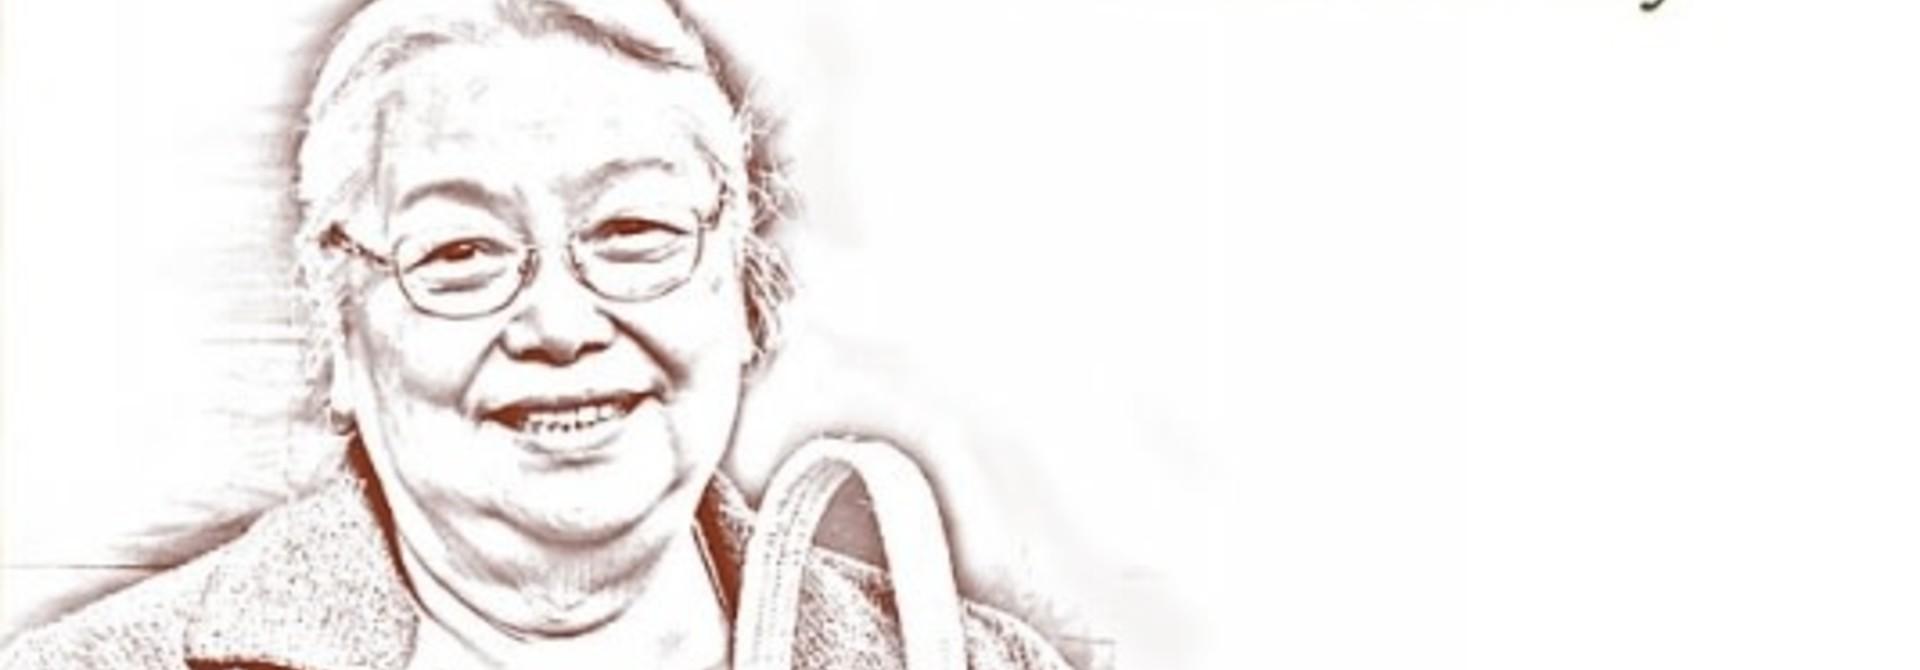 Xwelqwiya: The Life of a Sto:lo Matriarch